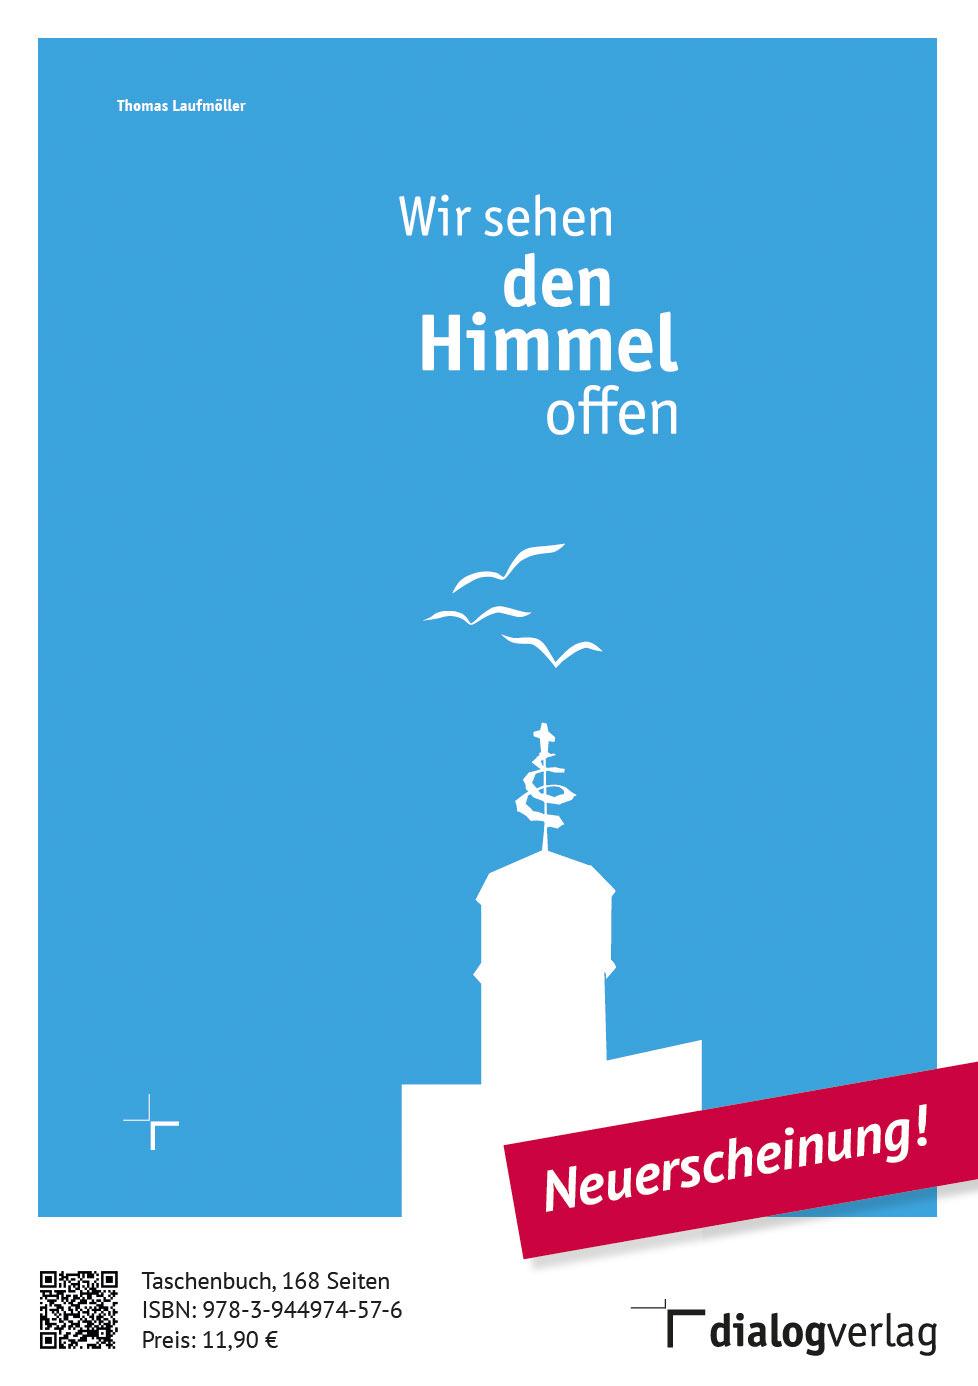 Thomas-Laufmoeller-friedensbotschaften-Himmel-offen